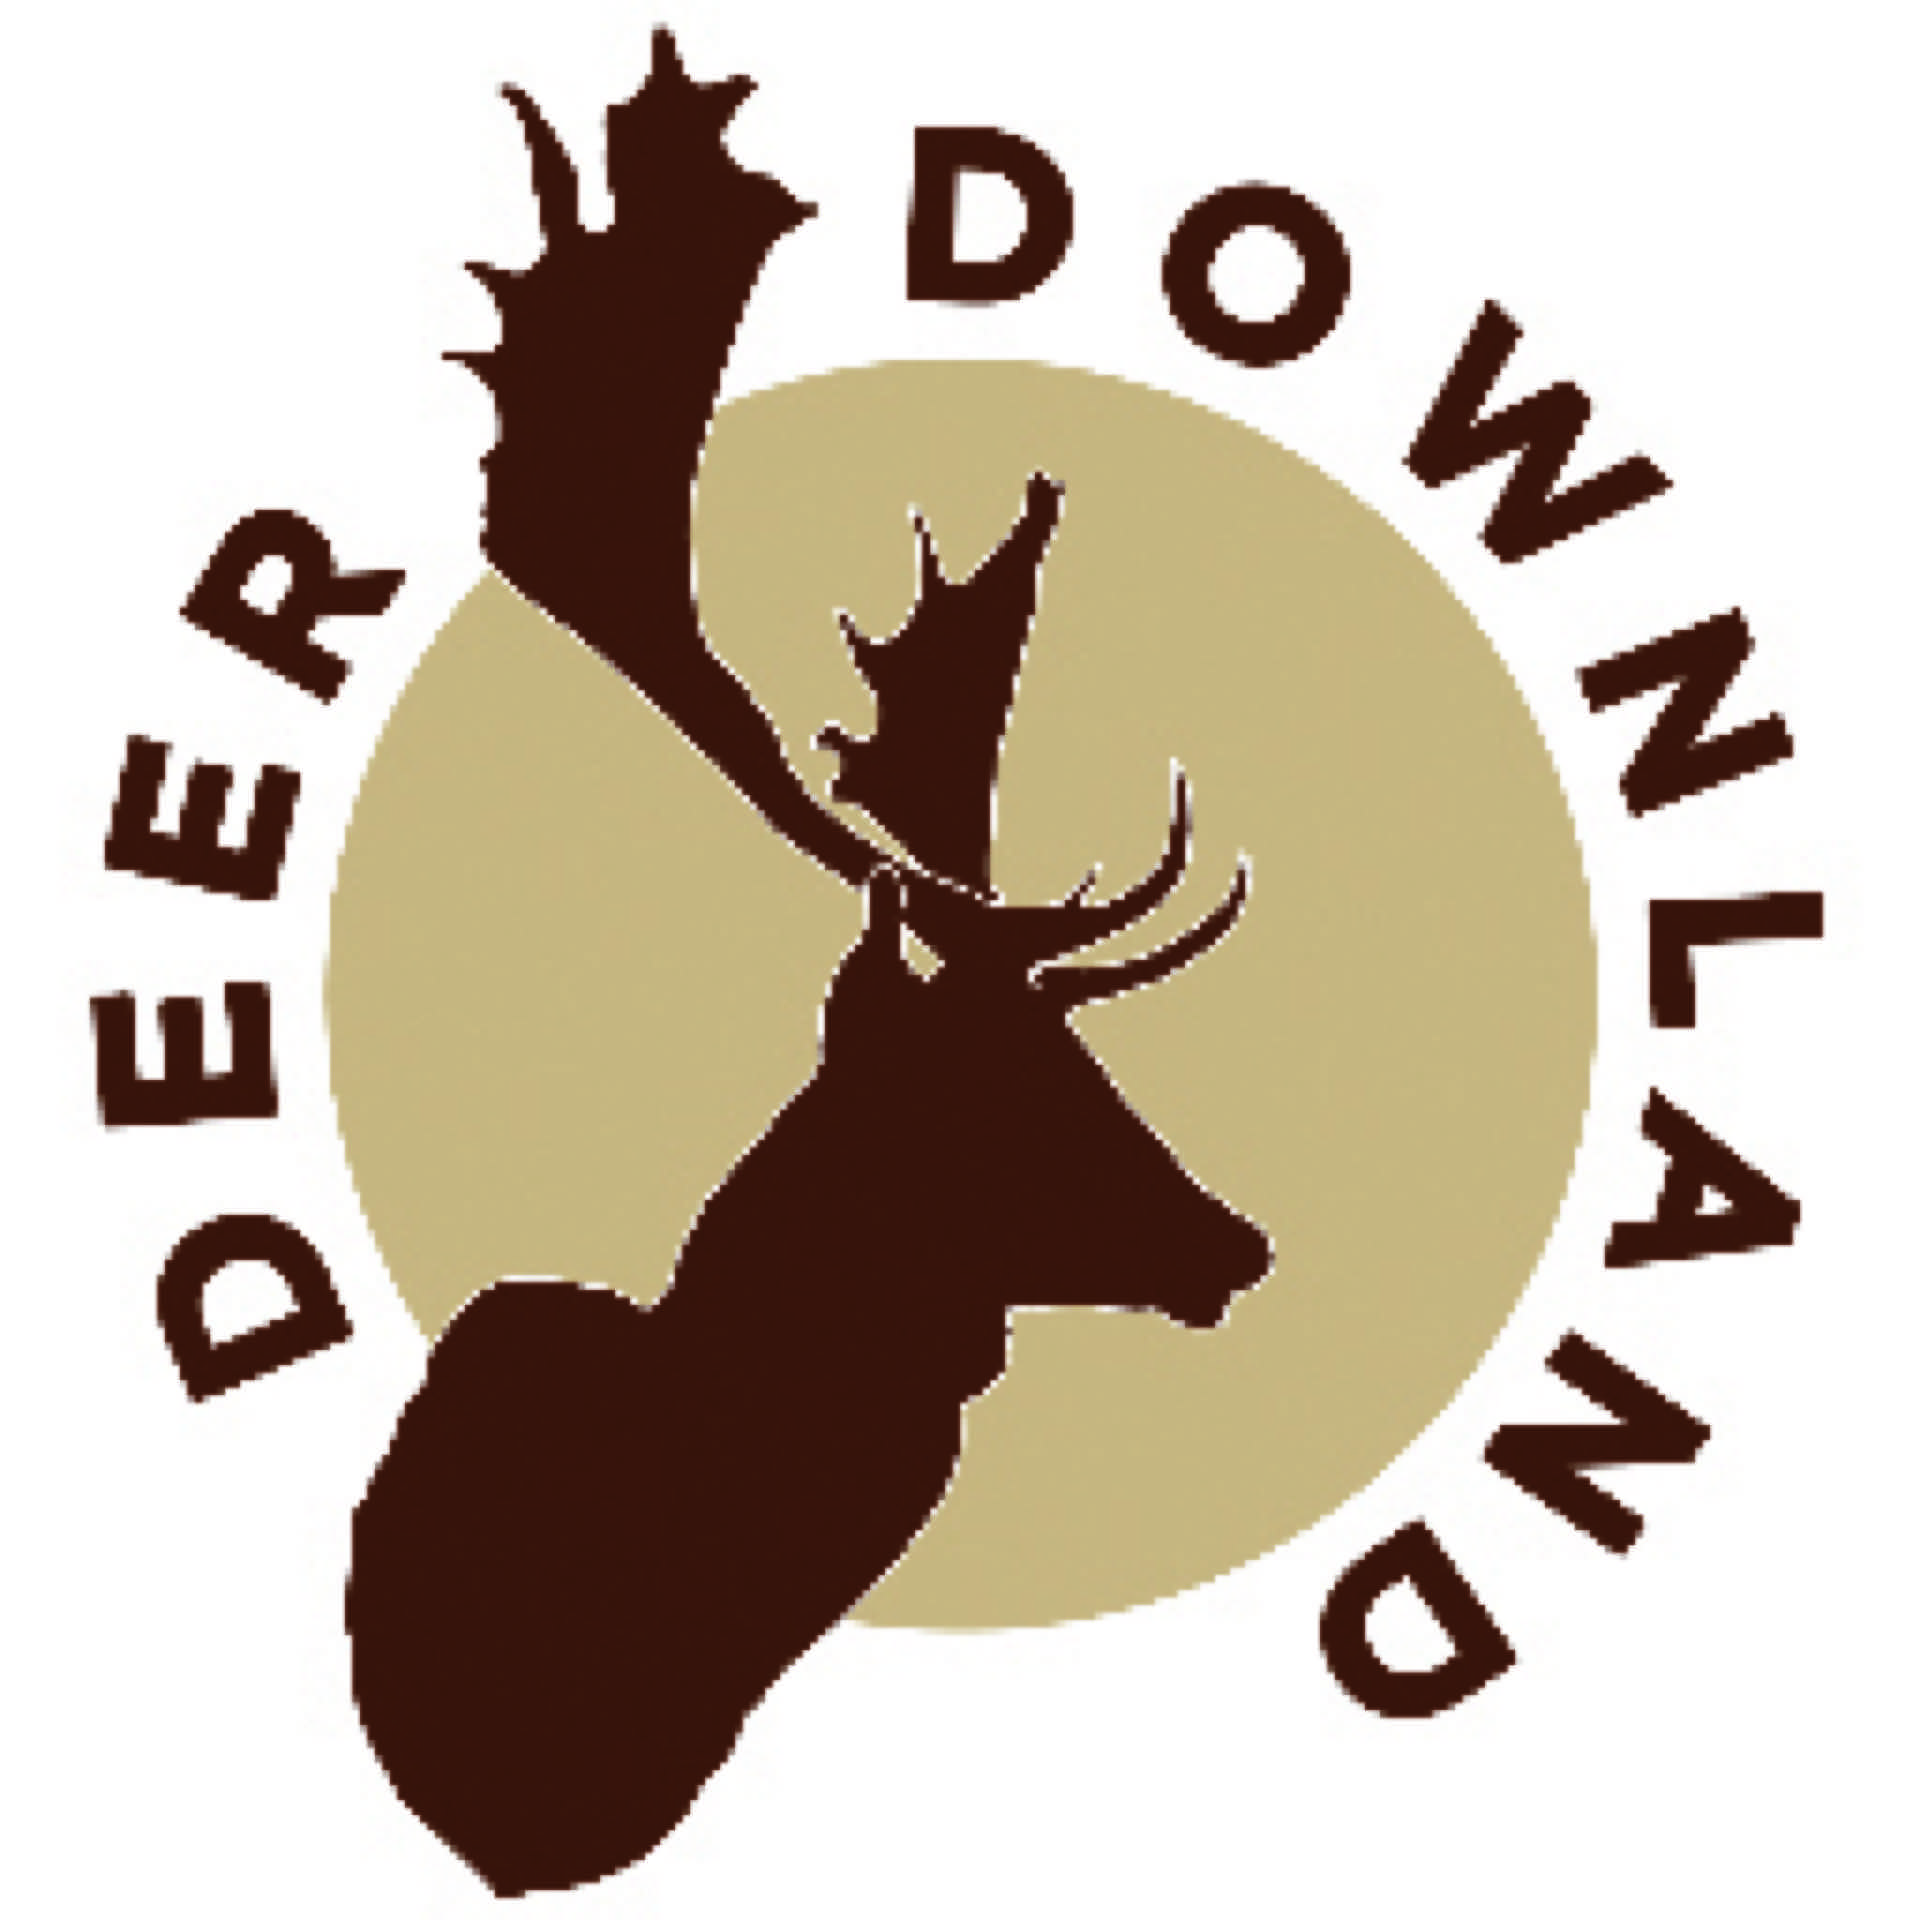 Downland deer logo jaegermagazin jagd Mike Robinson jagen Damwild Wildbret